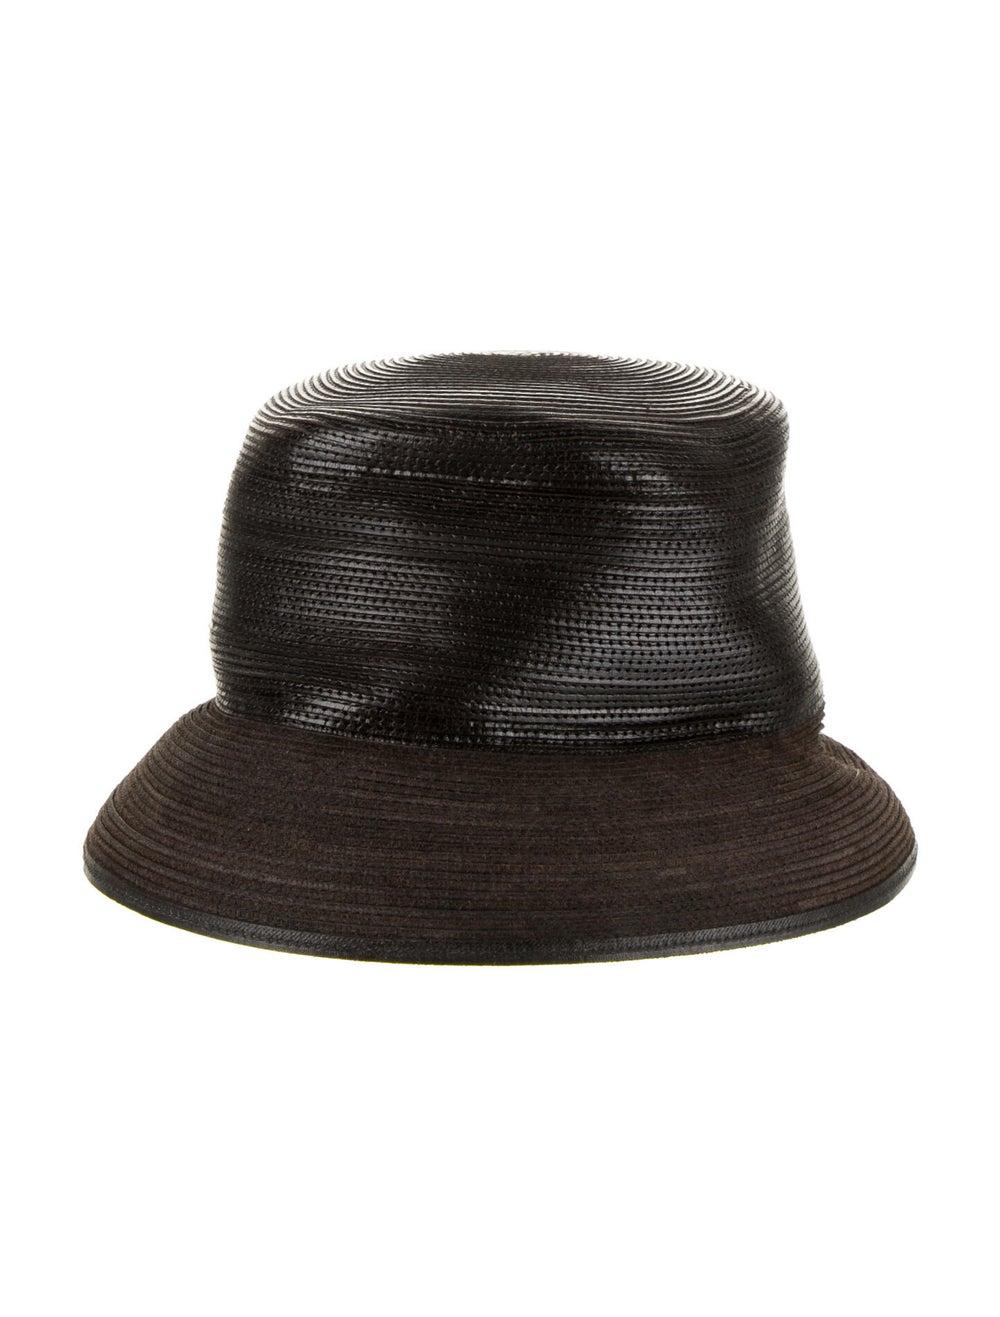 Patricia Underwood Leather Brim Hat Brown - image 1